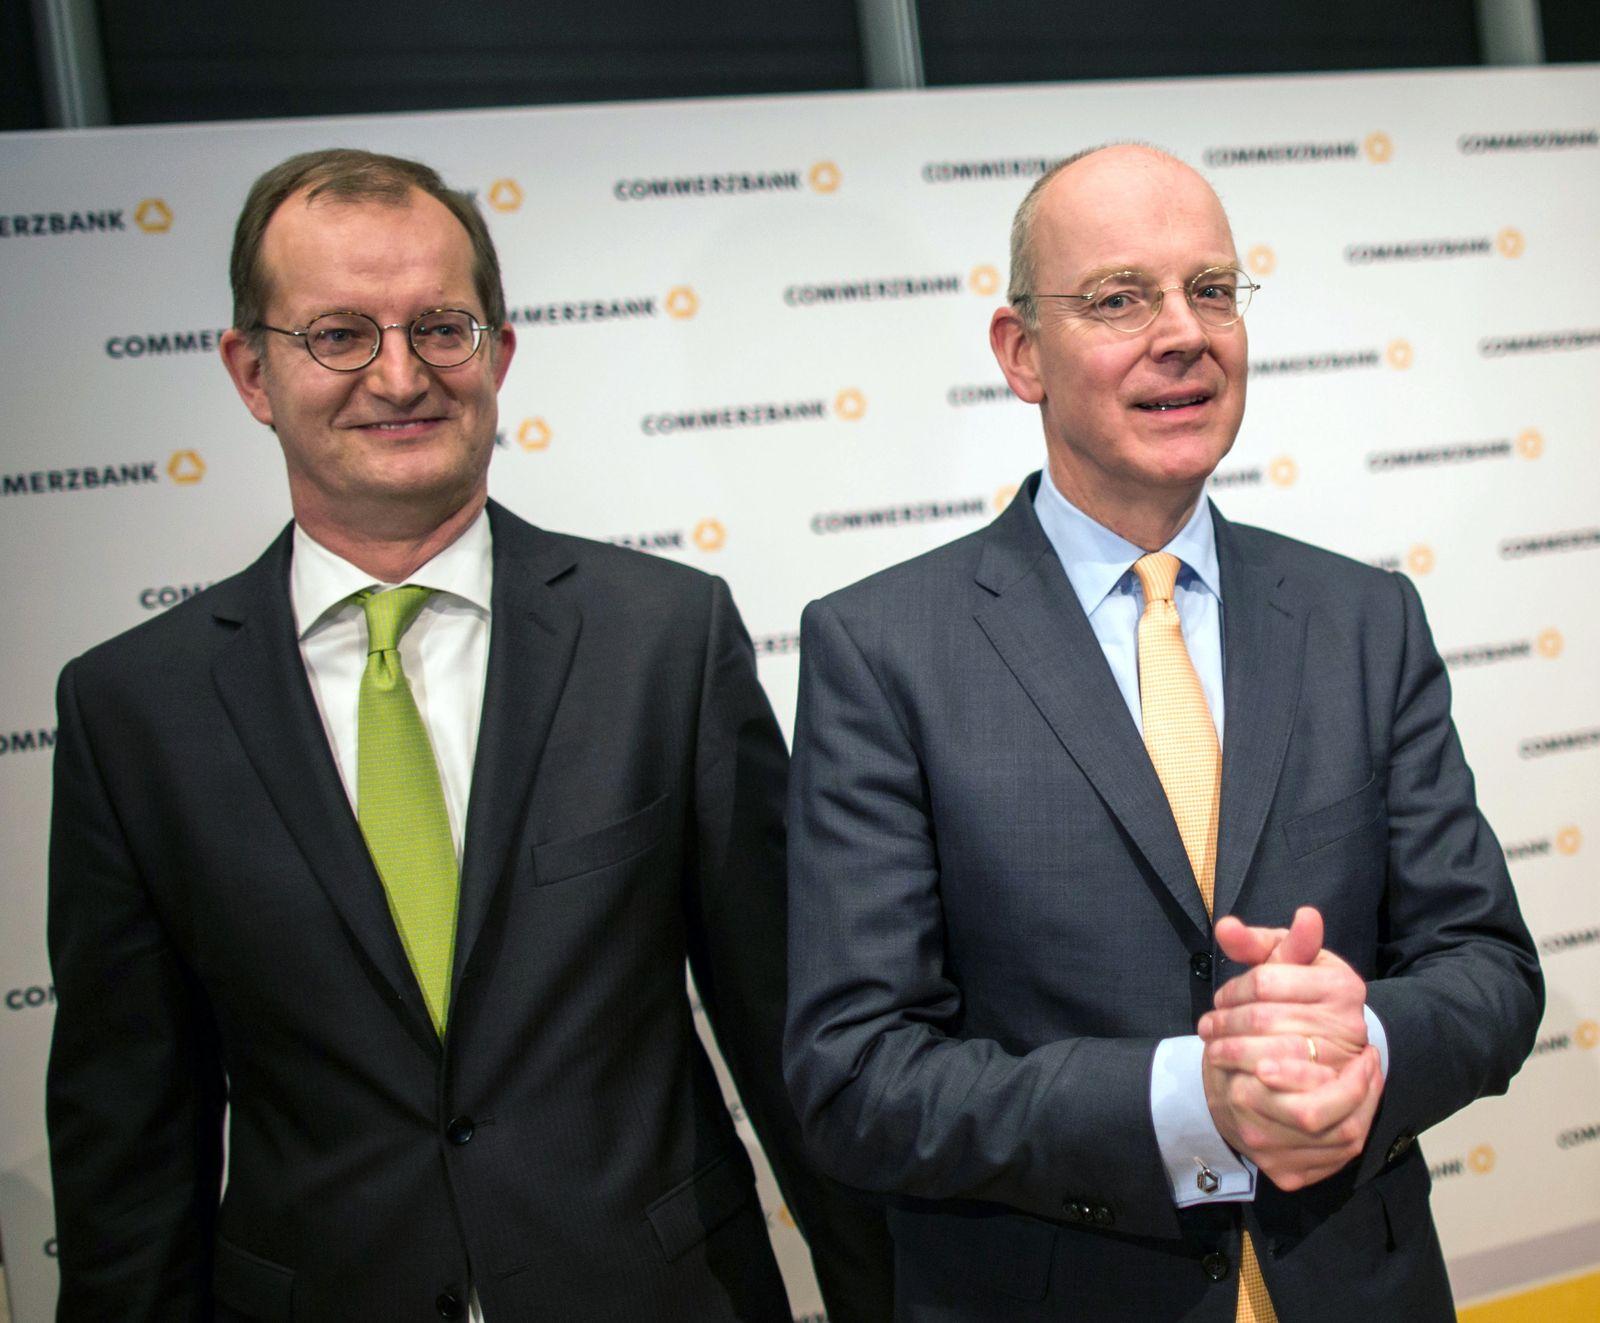 Martin Zielke/ Martin Blessing/ Commerzbank